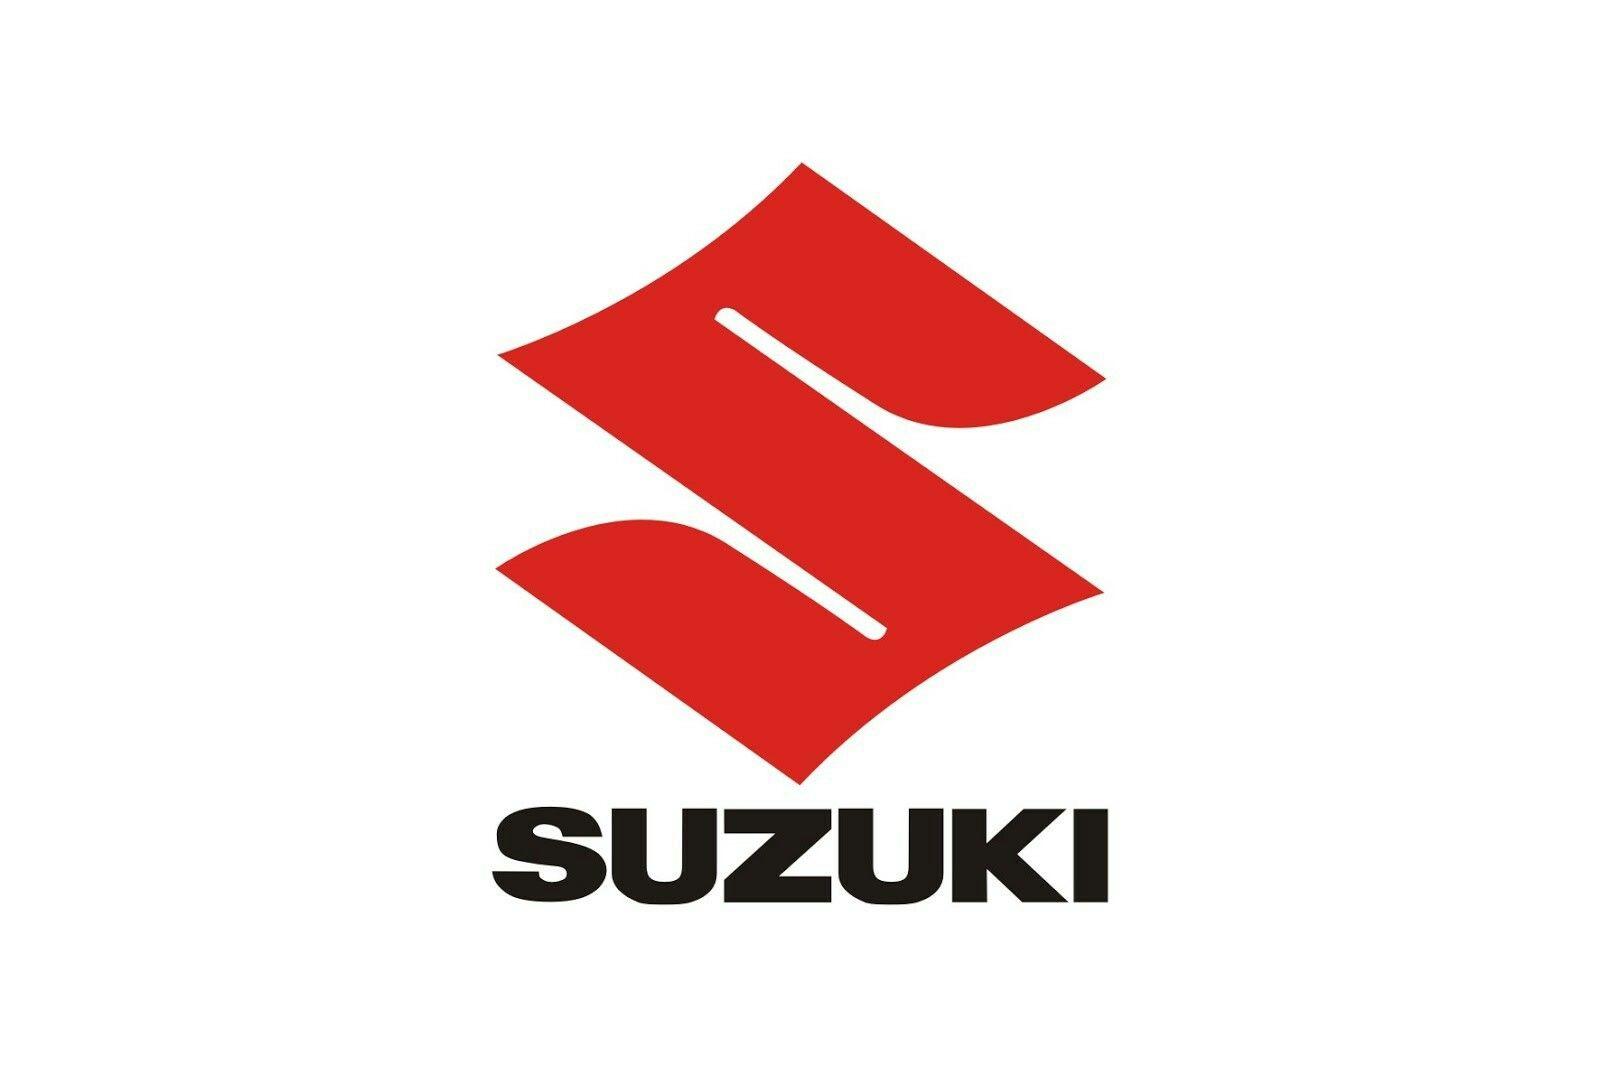 Suzuki Logo, Suzuki Car Symbol Meaning and History | Car ...